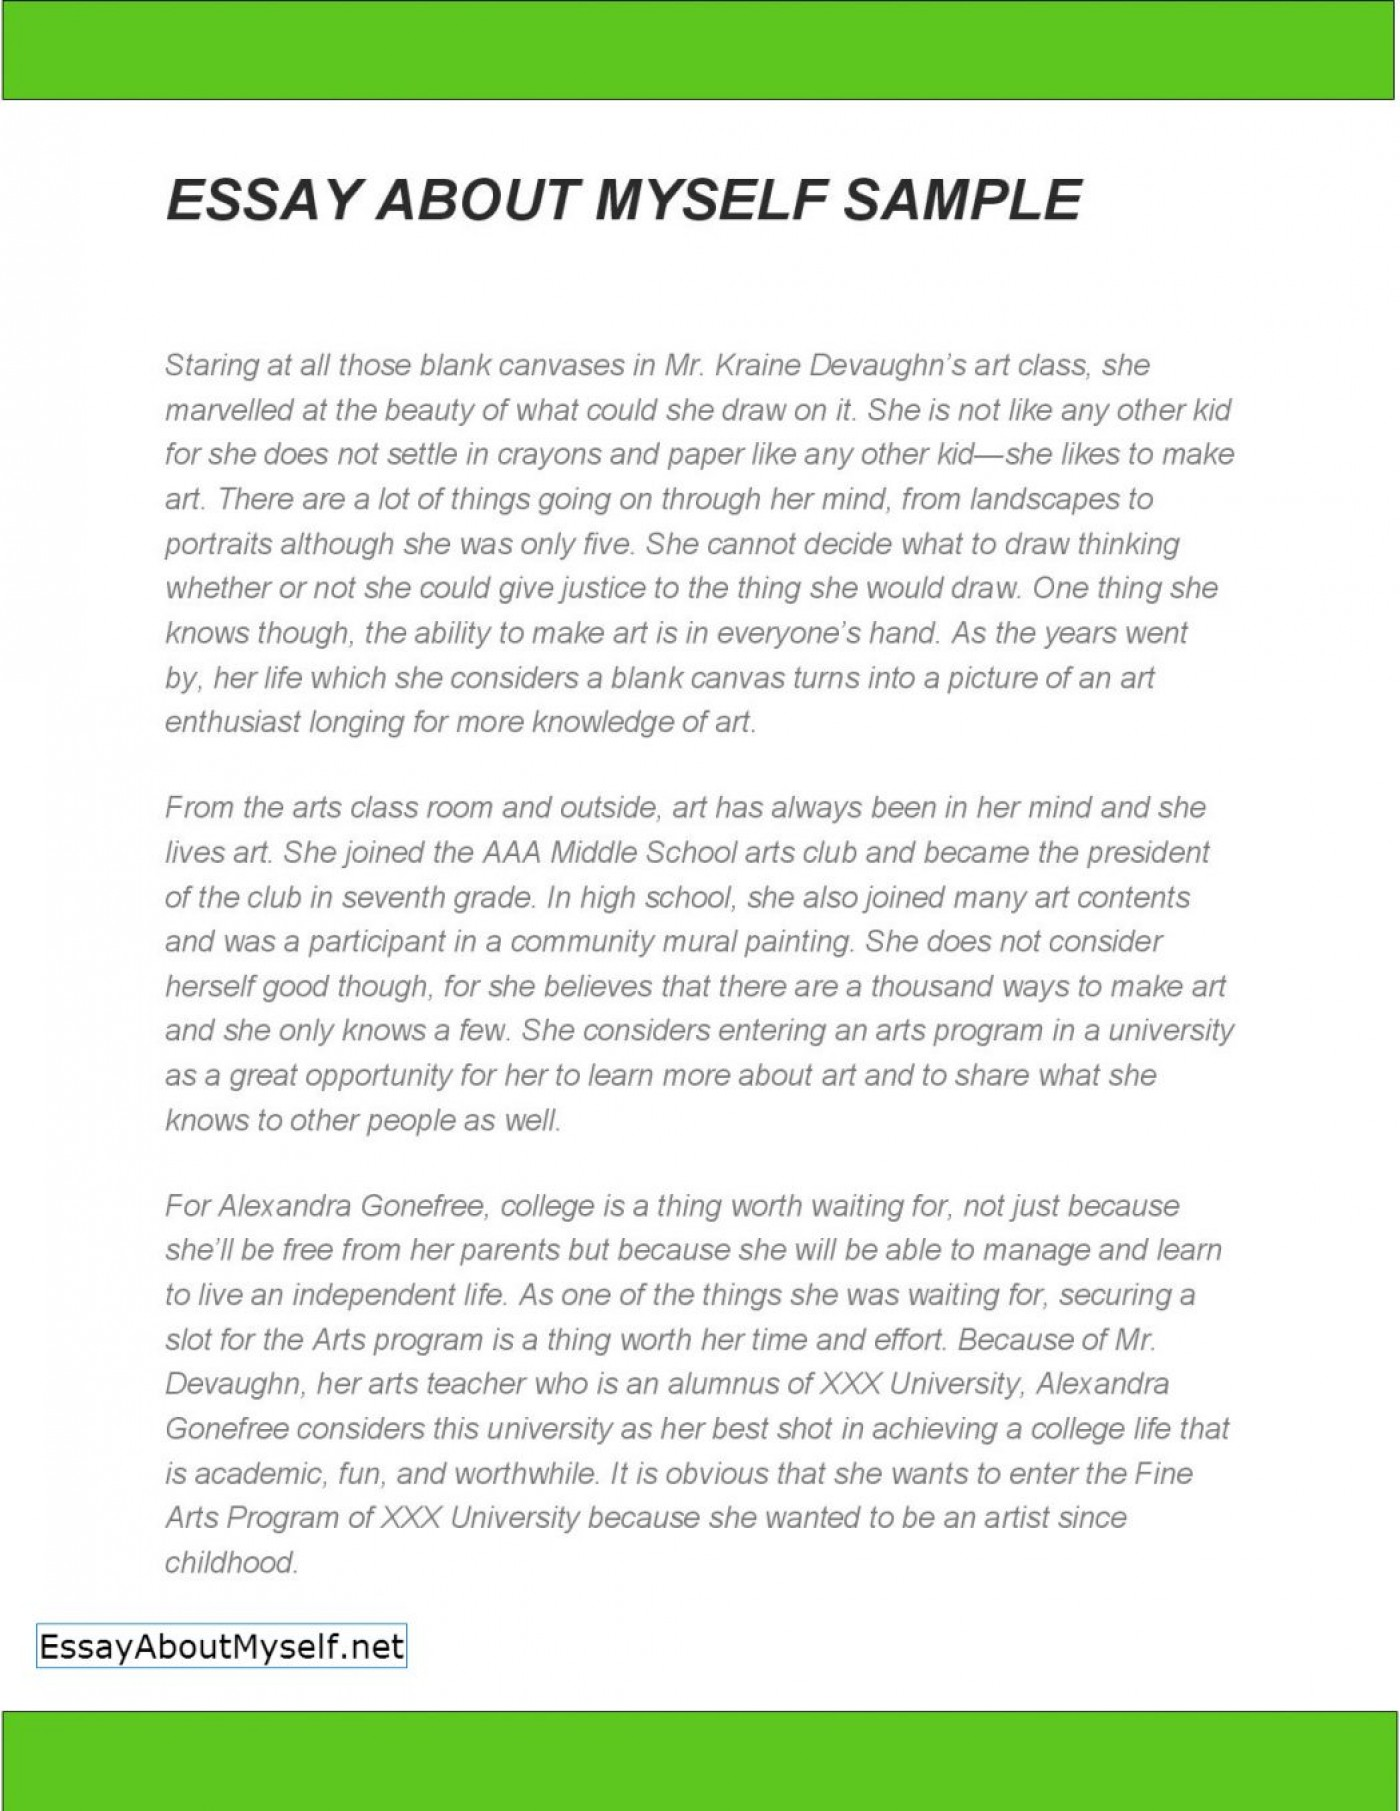 Alexander pope essay on criticism summary